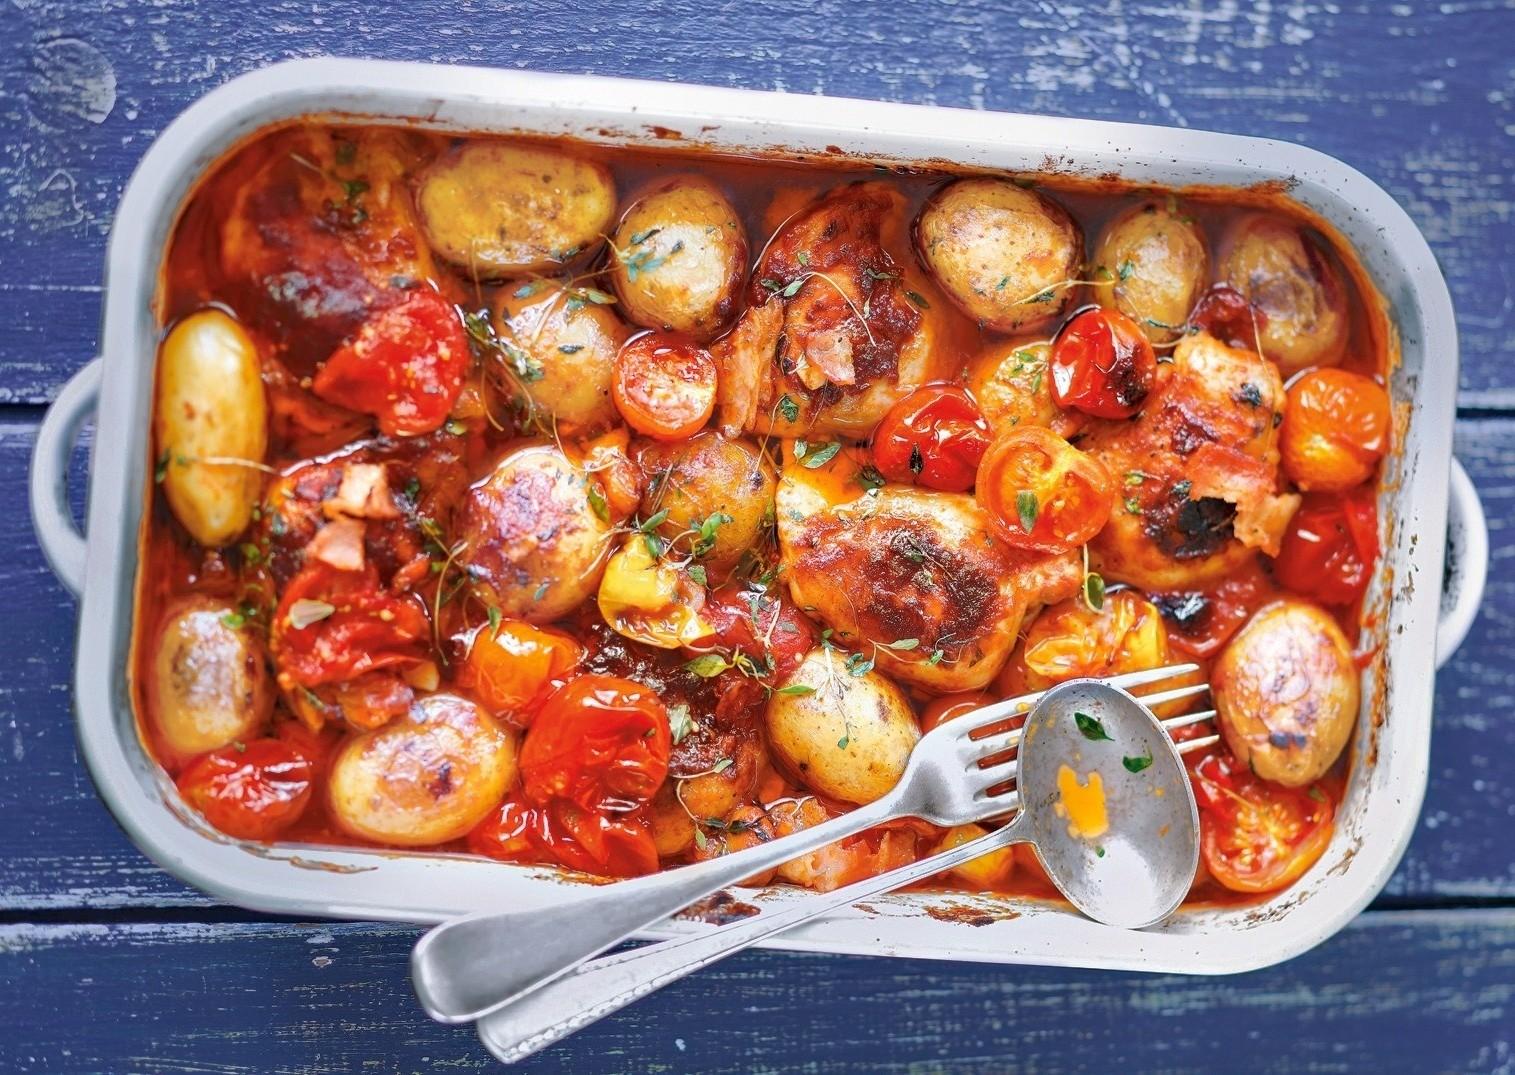 Сезон томатов: 4 рецепта блюд с помидорами